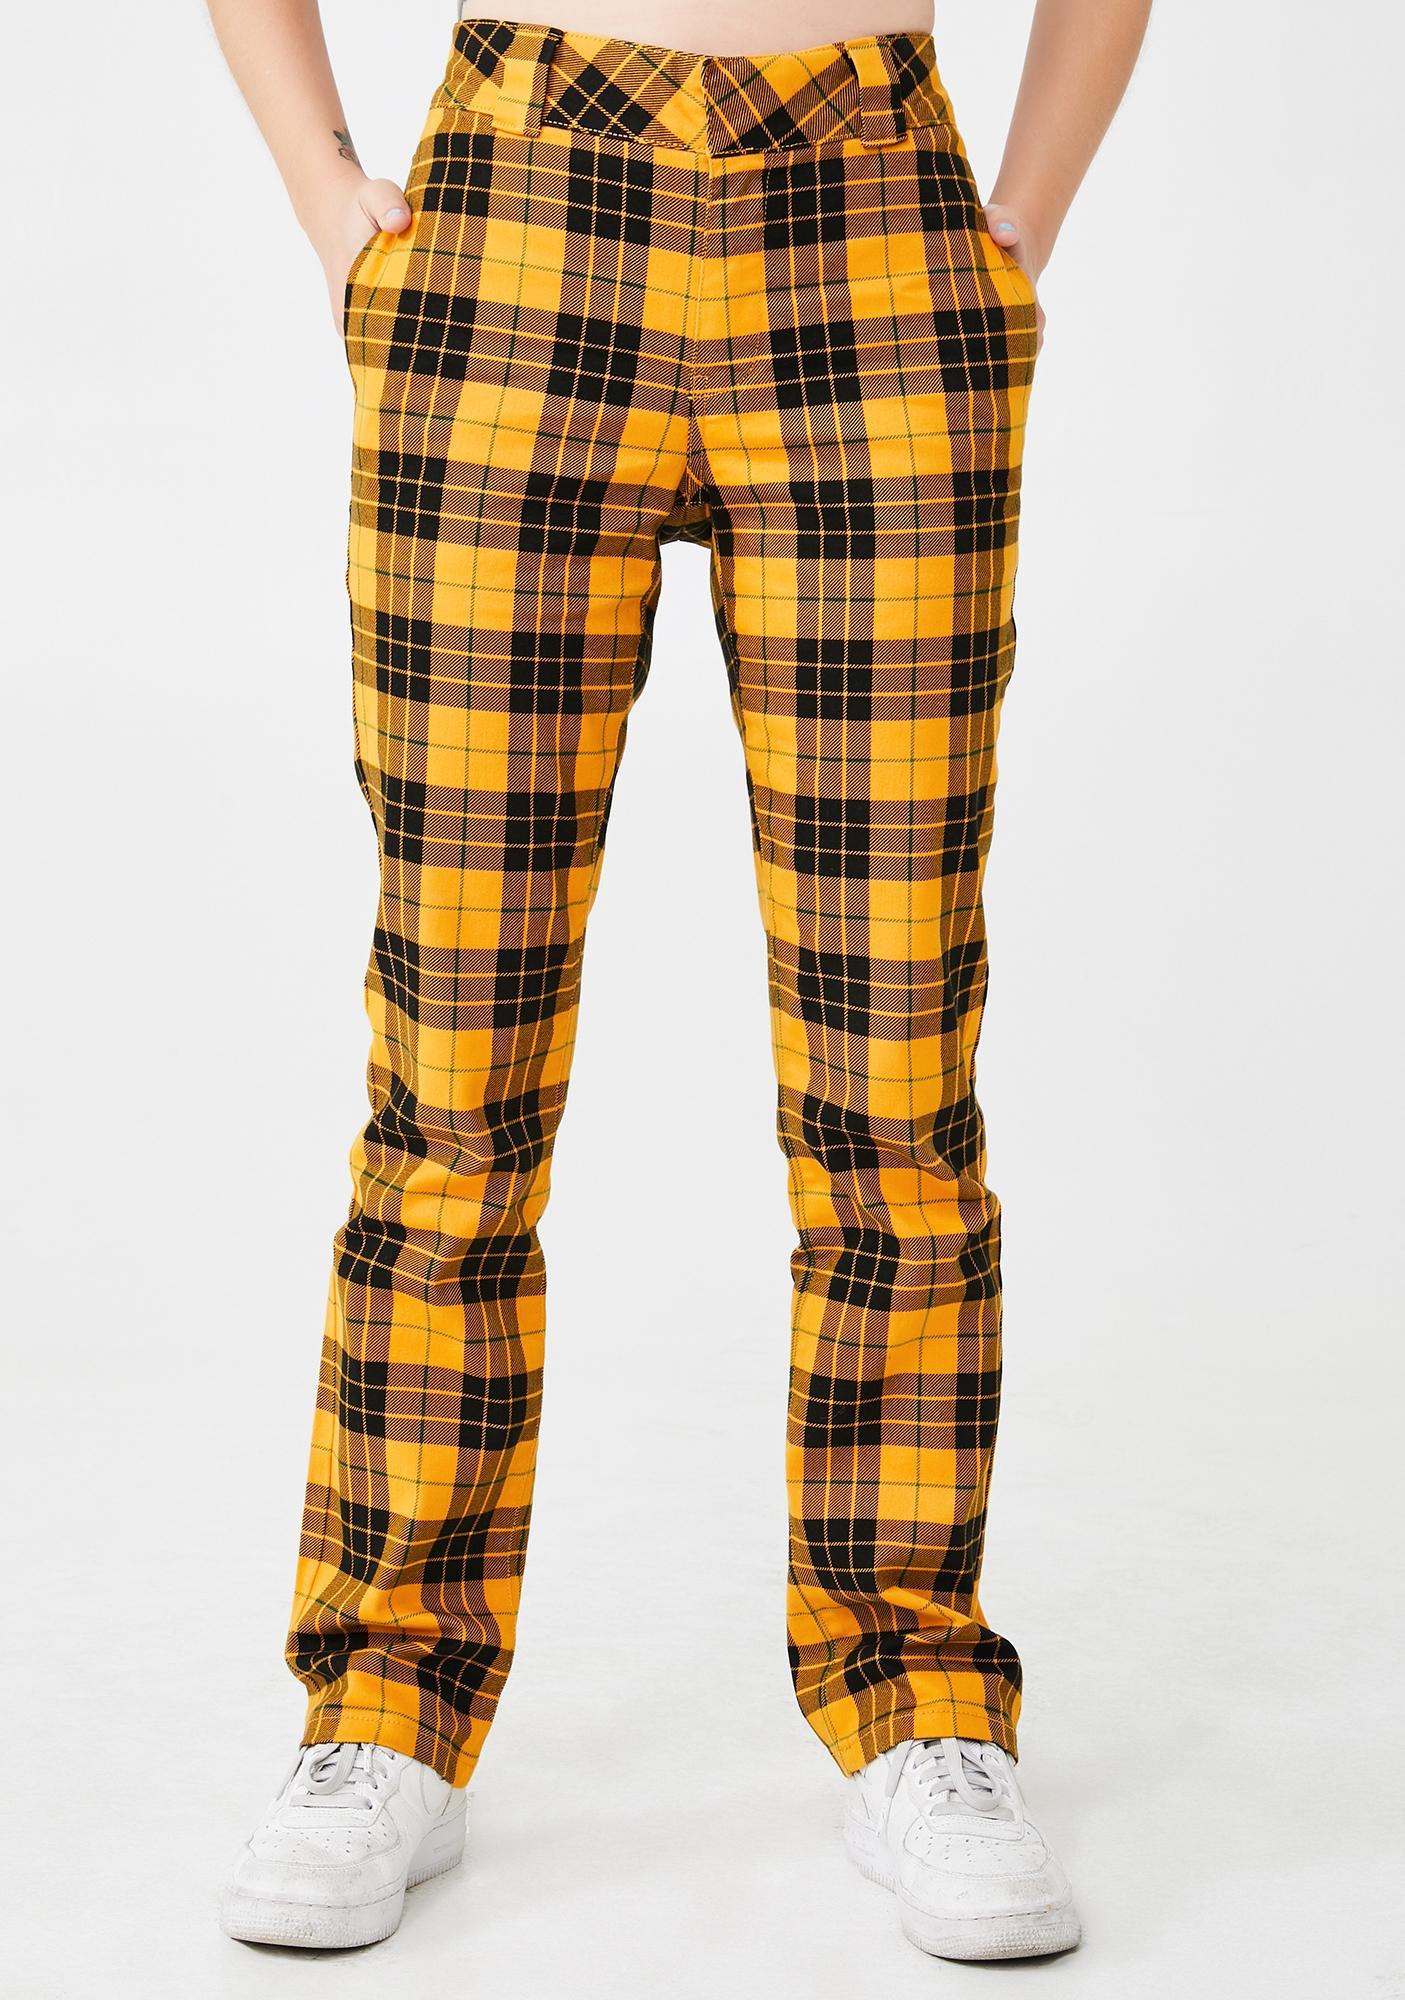 Dickies Girl Mcleod Tartan Stretchy Twill Pants